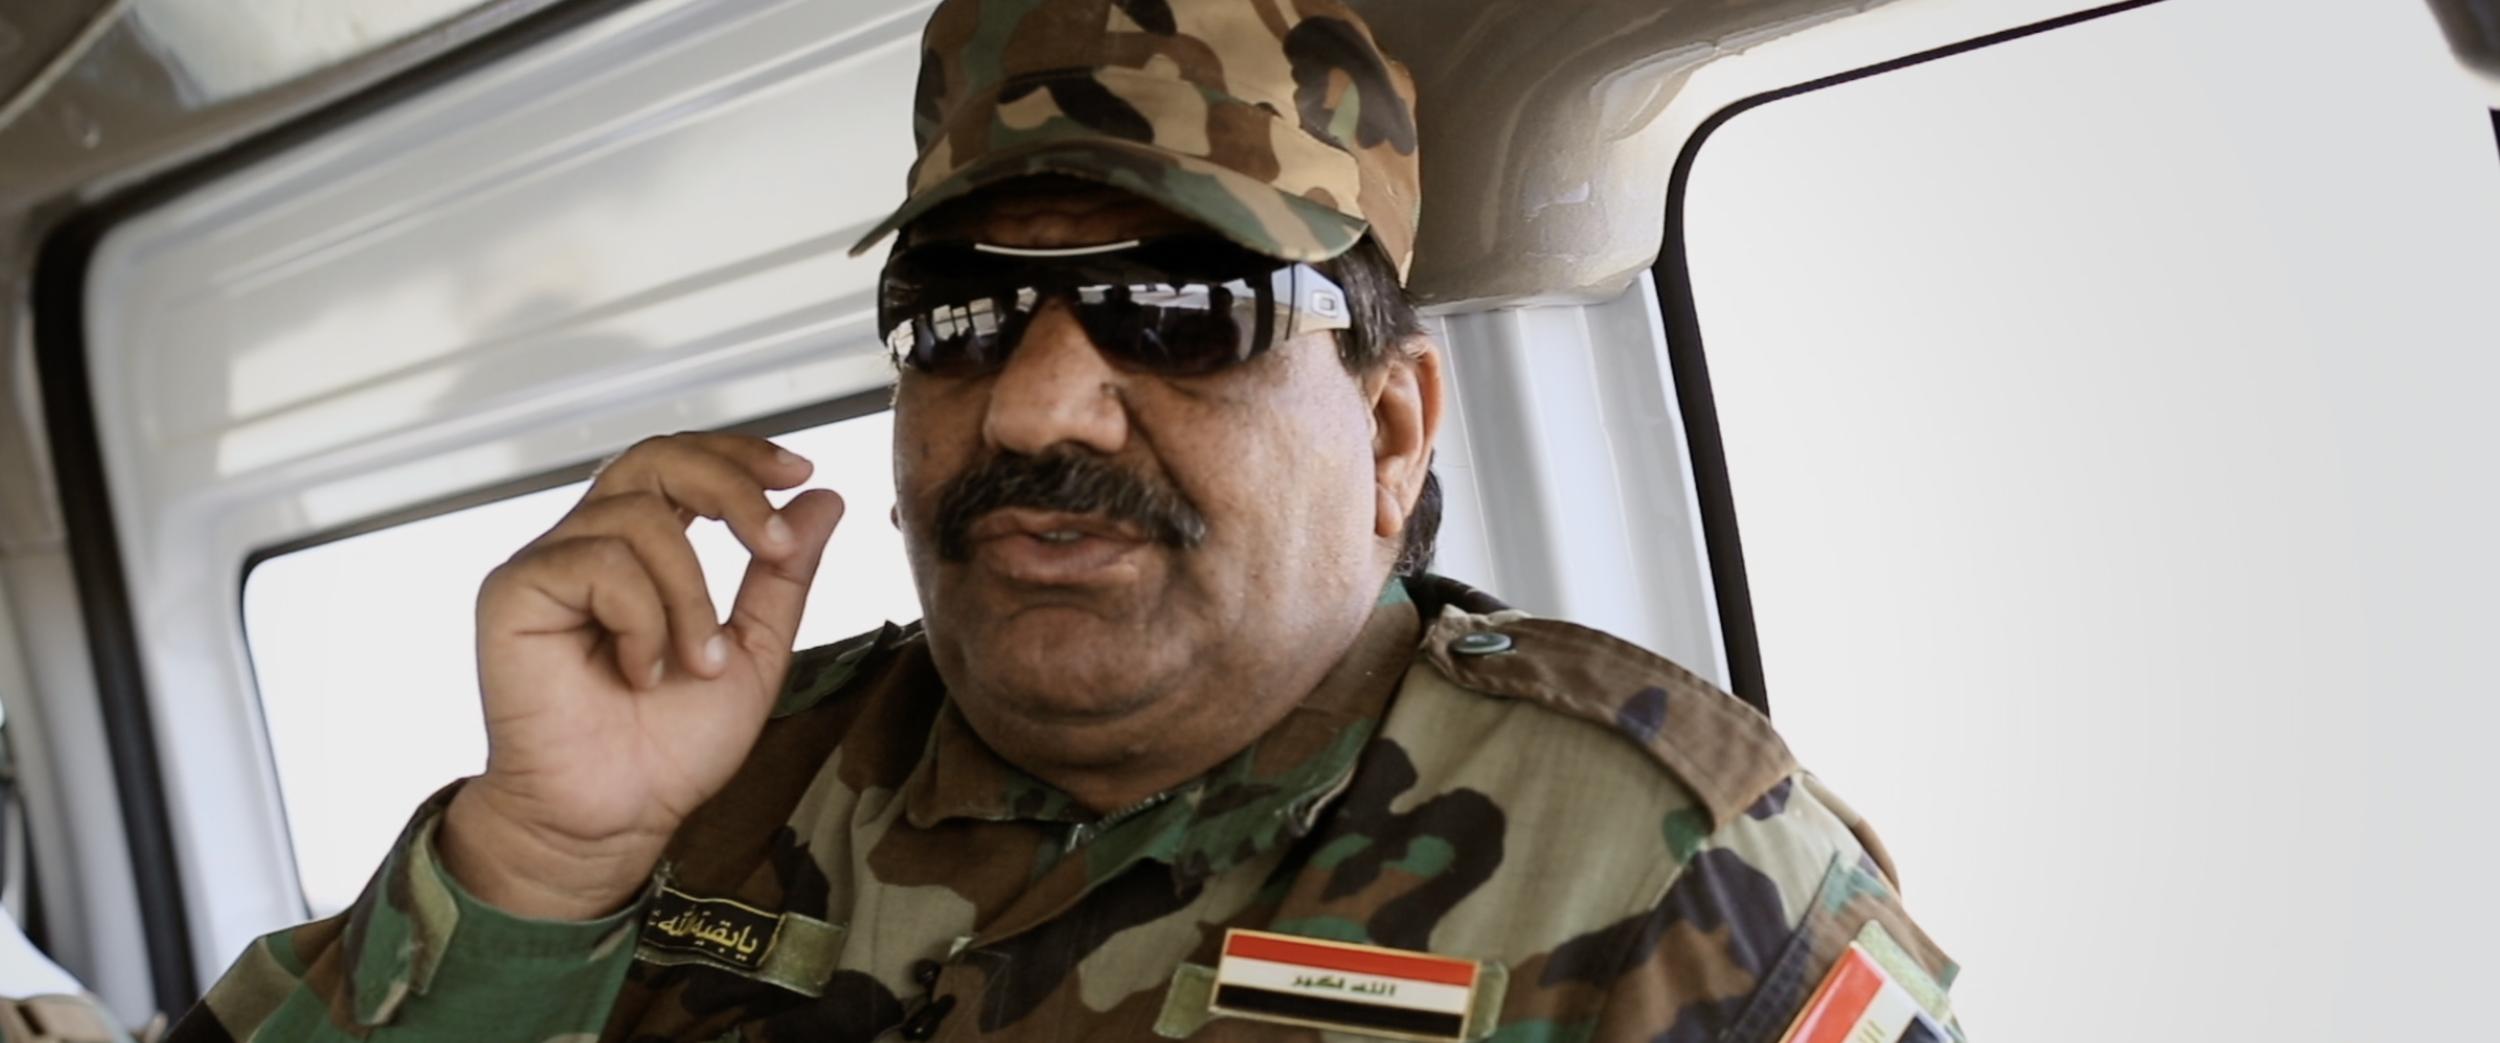 Sheikh Saleh speaking to journalist during ride.png